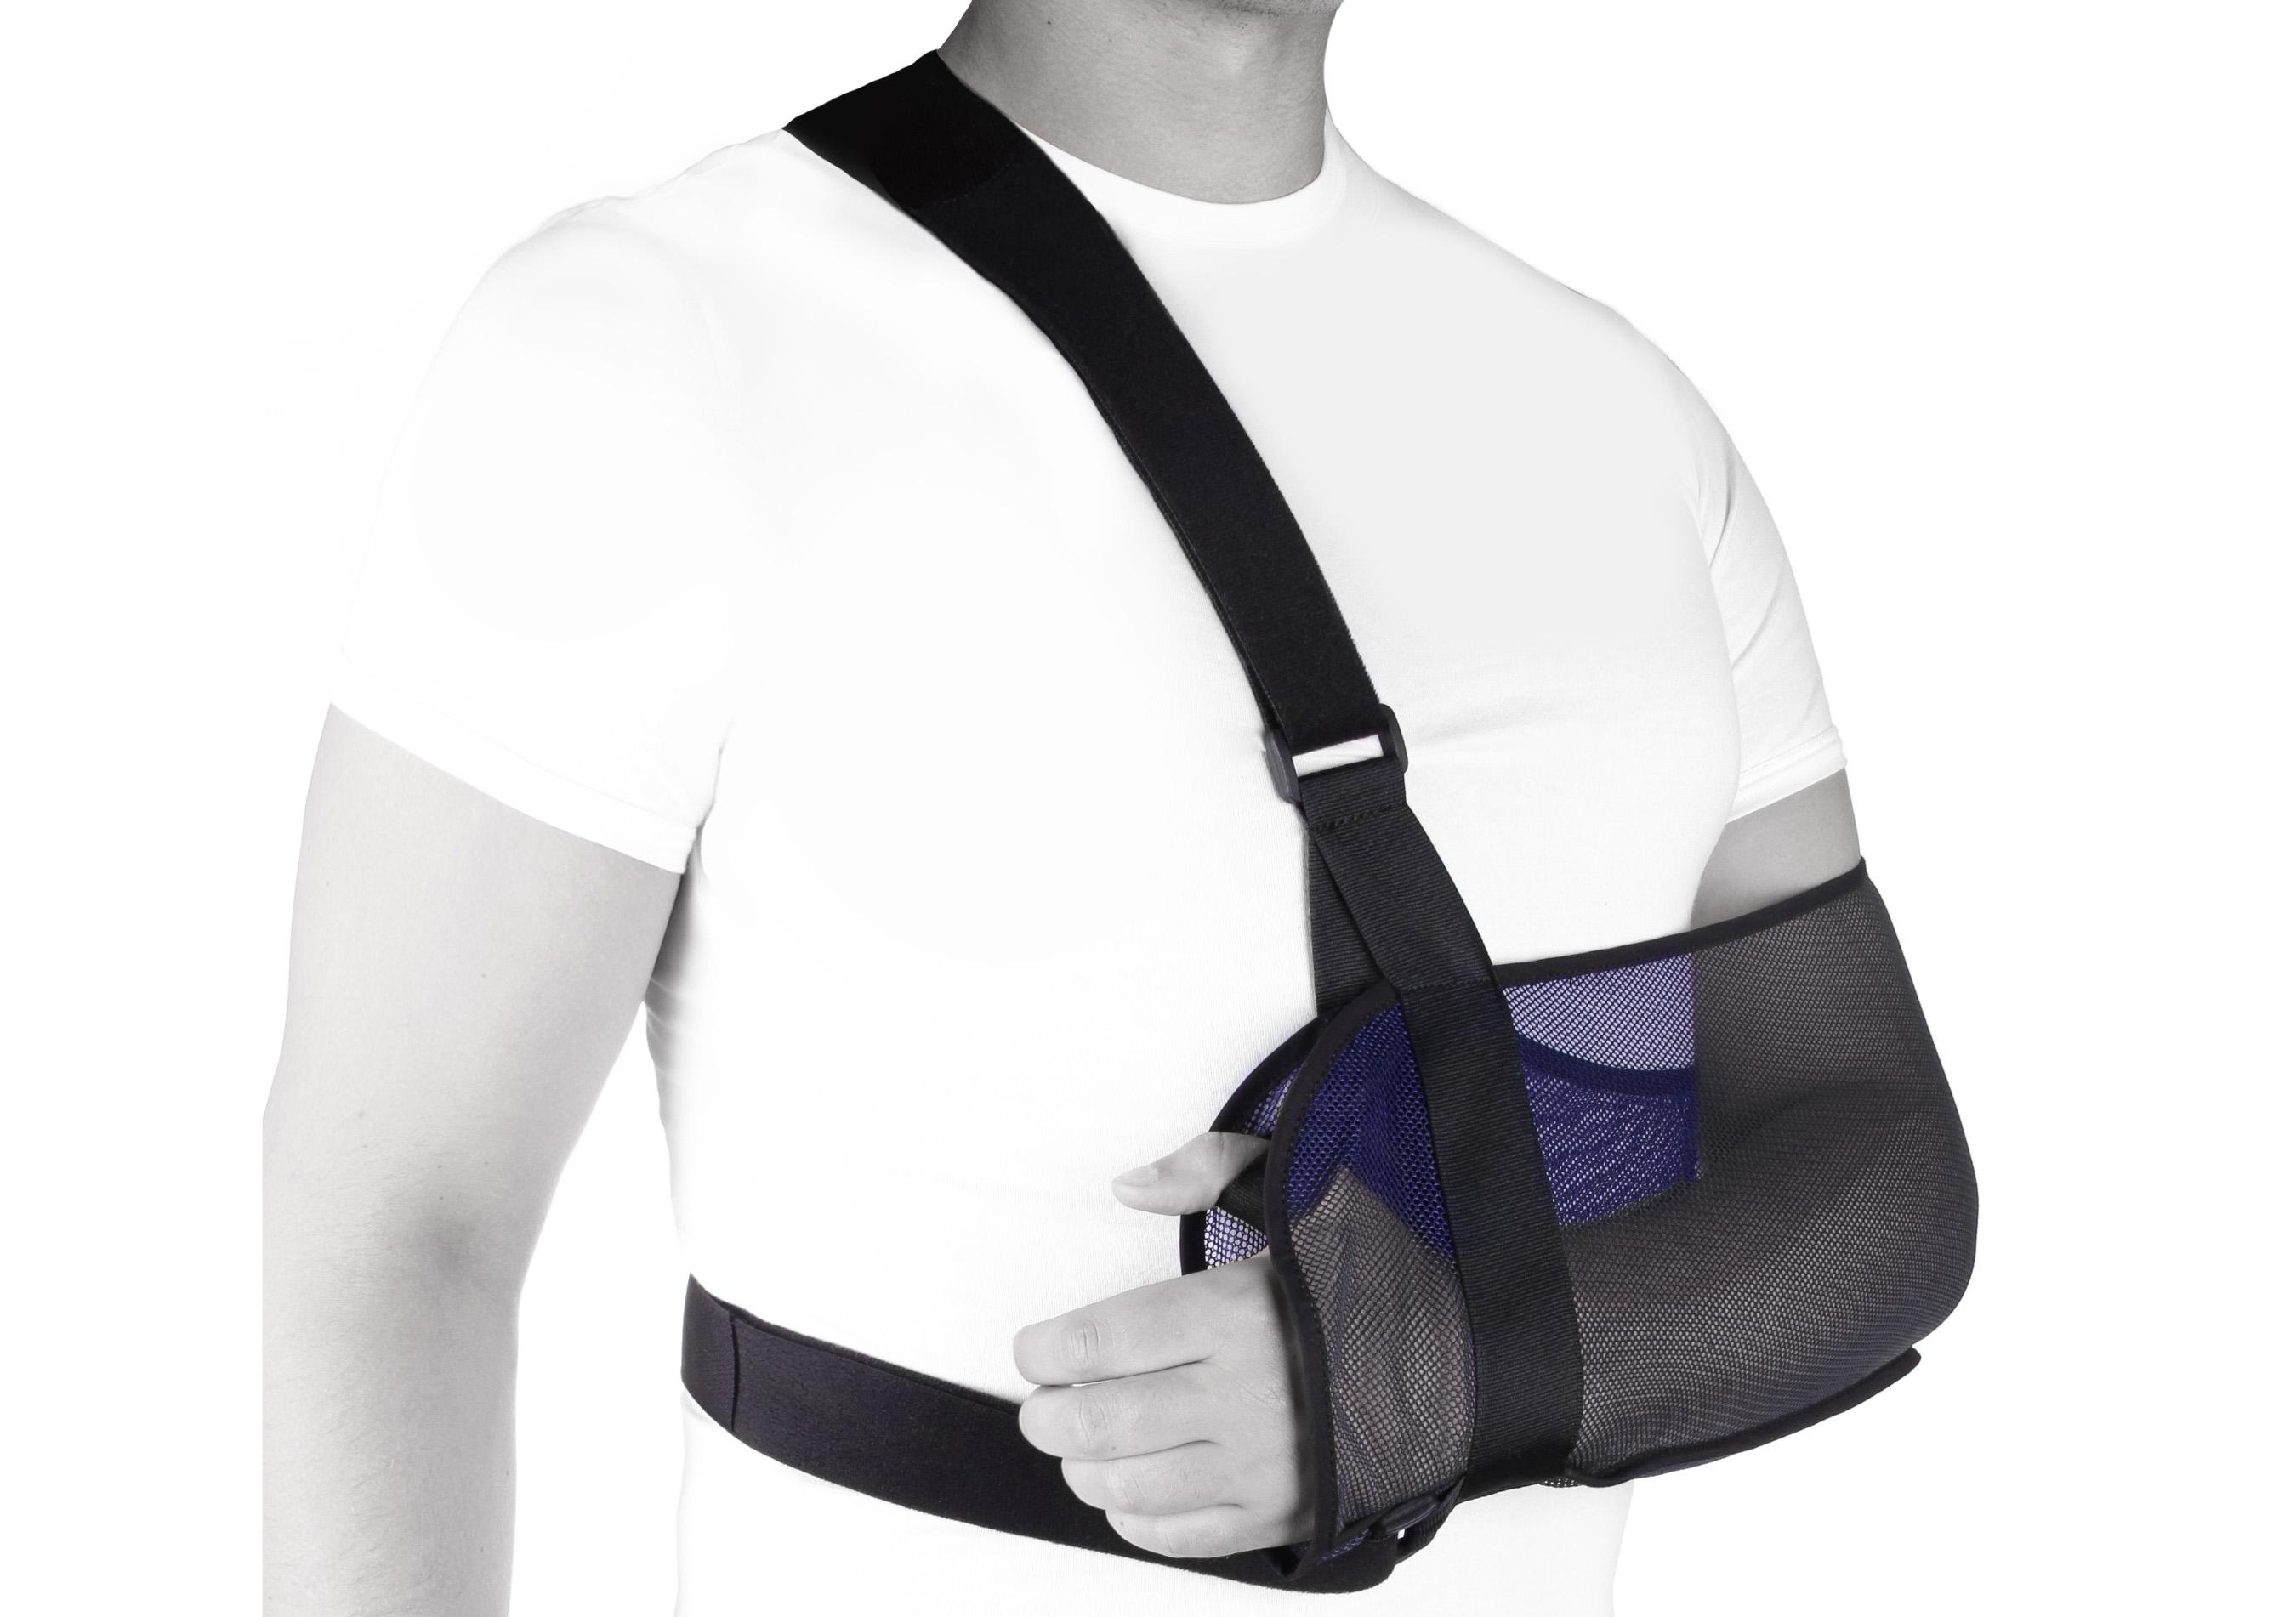 Повязка на руку при переломе своими руками